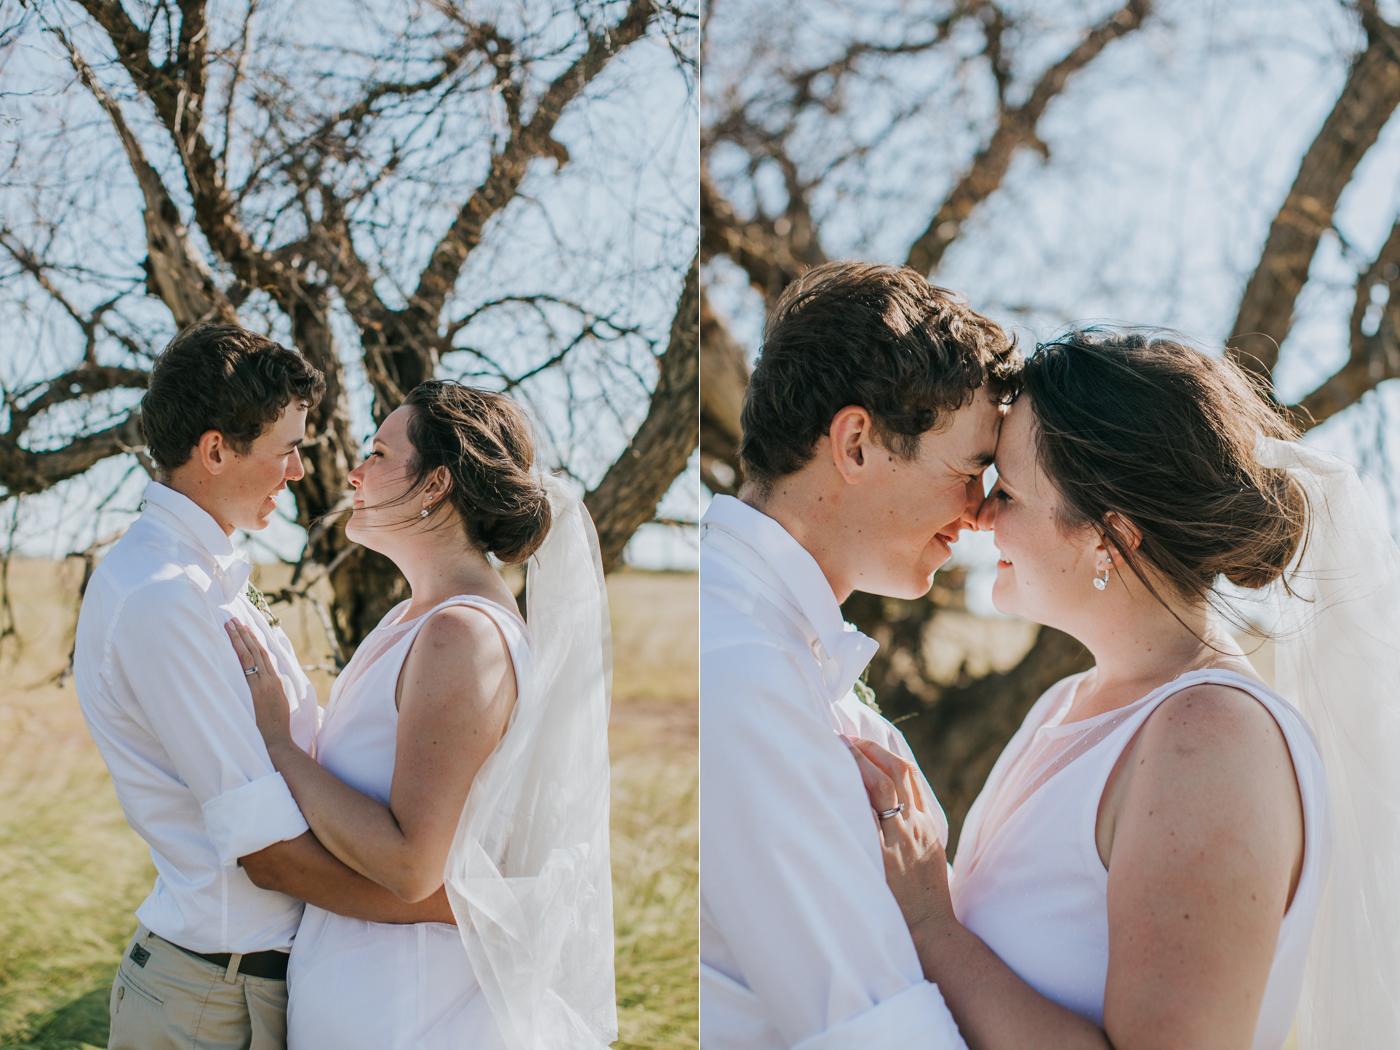 Nicolle & Jacob - Dubbo Wedding - Country Australia - Samantha Heather Photography-173.jpg